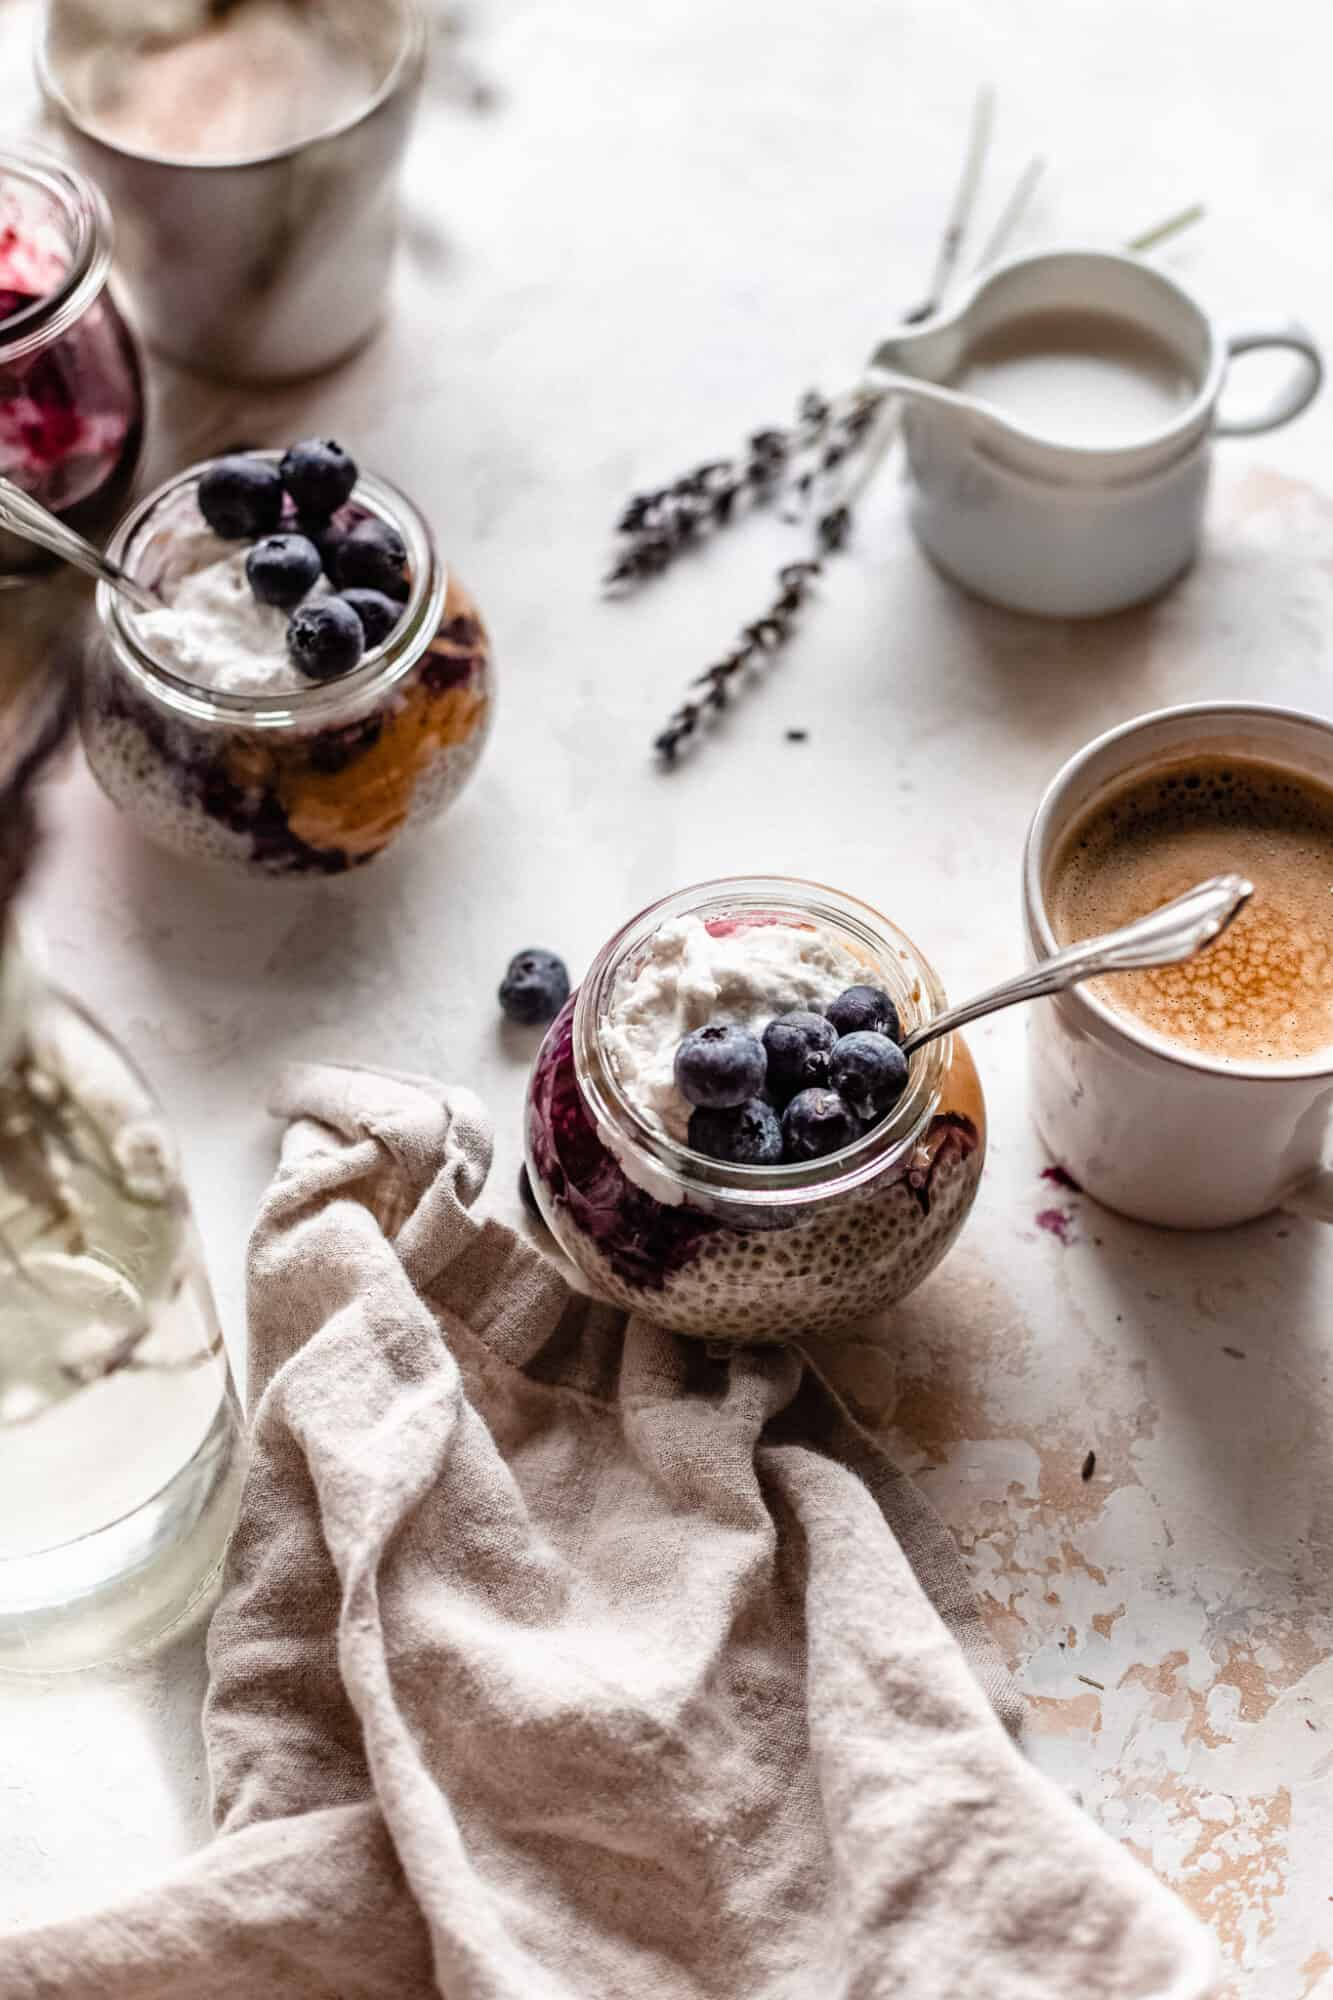 jars of chia pudding and coffee